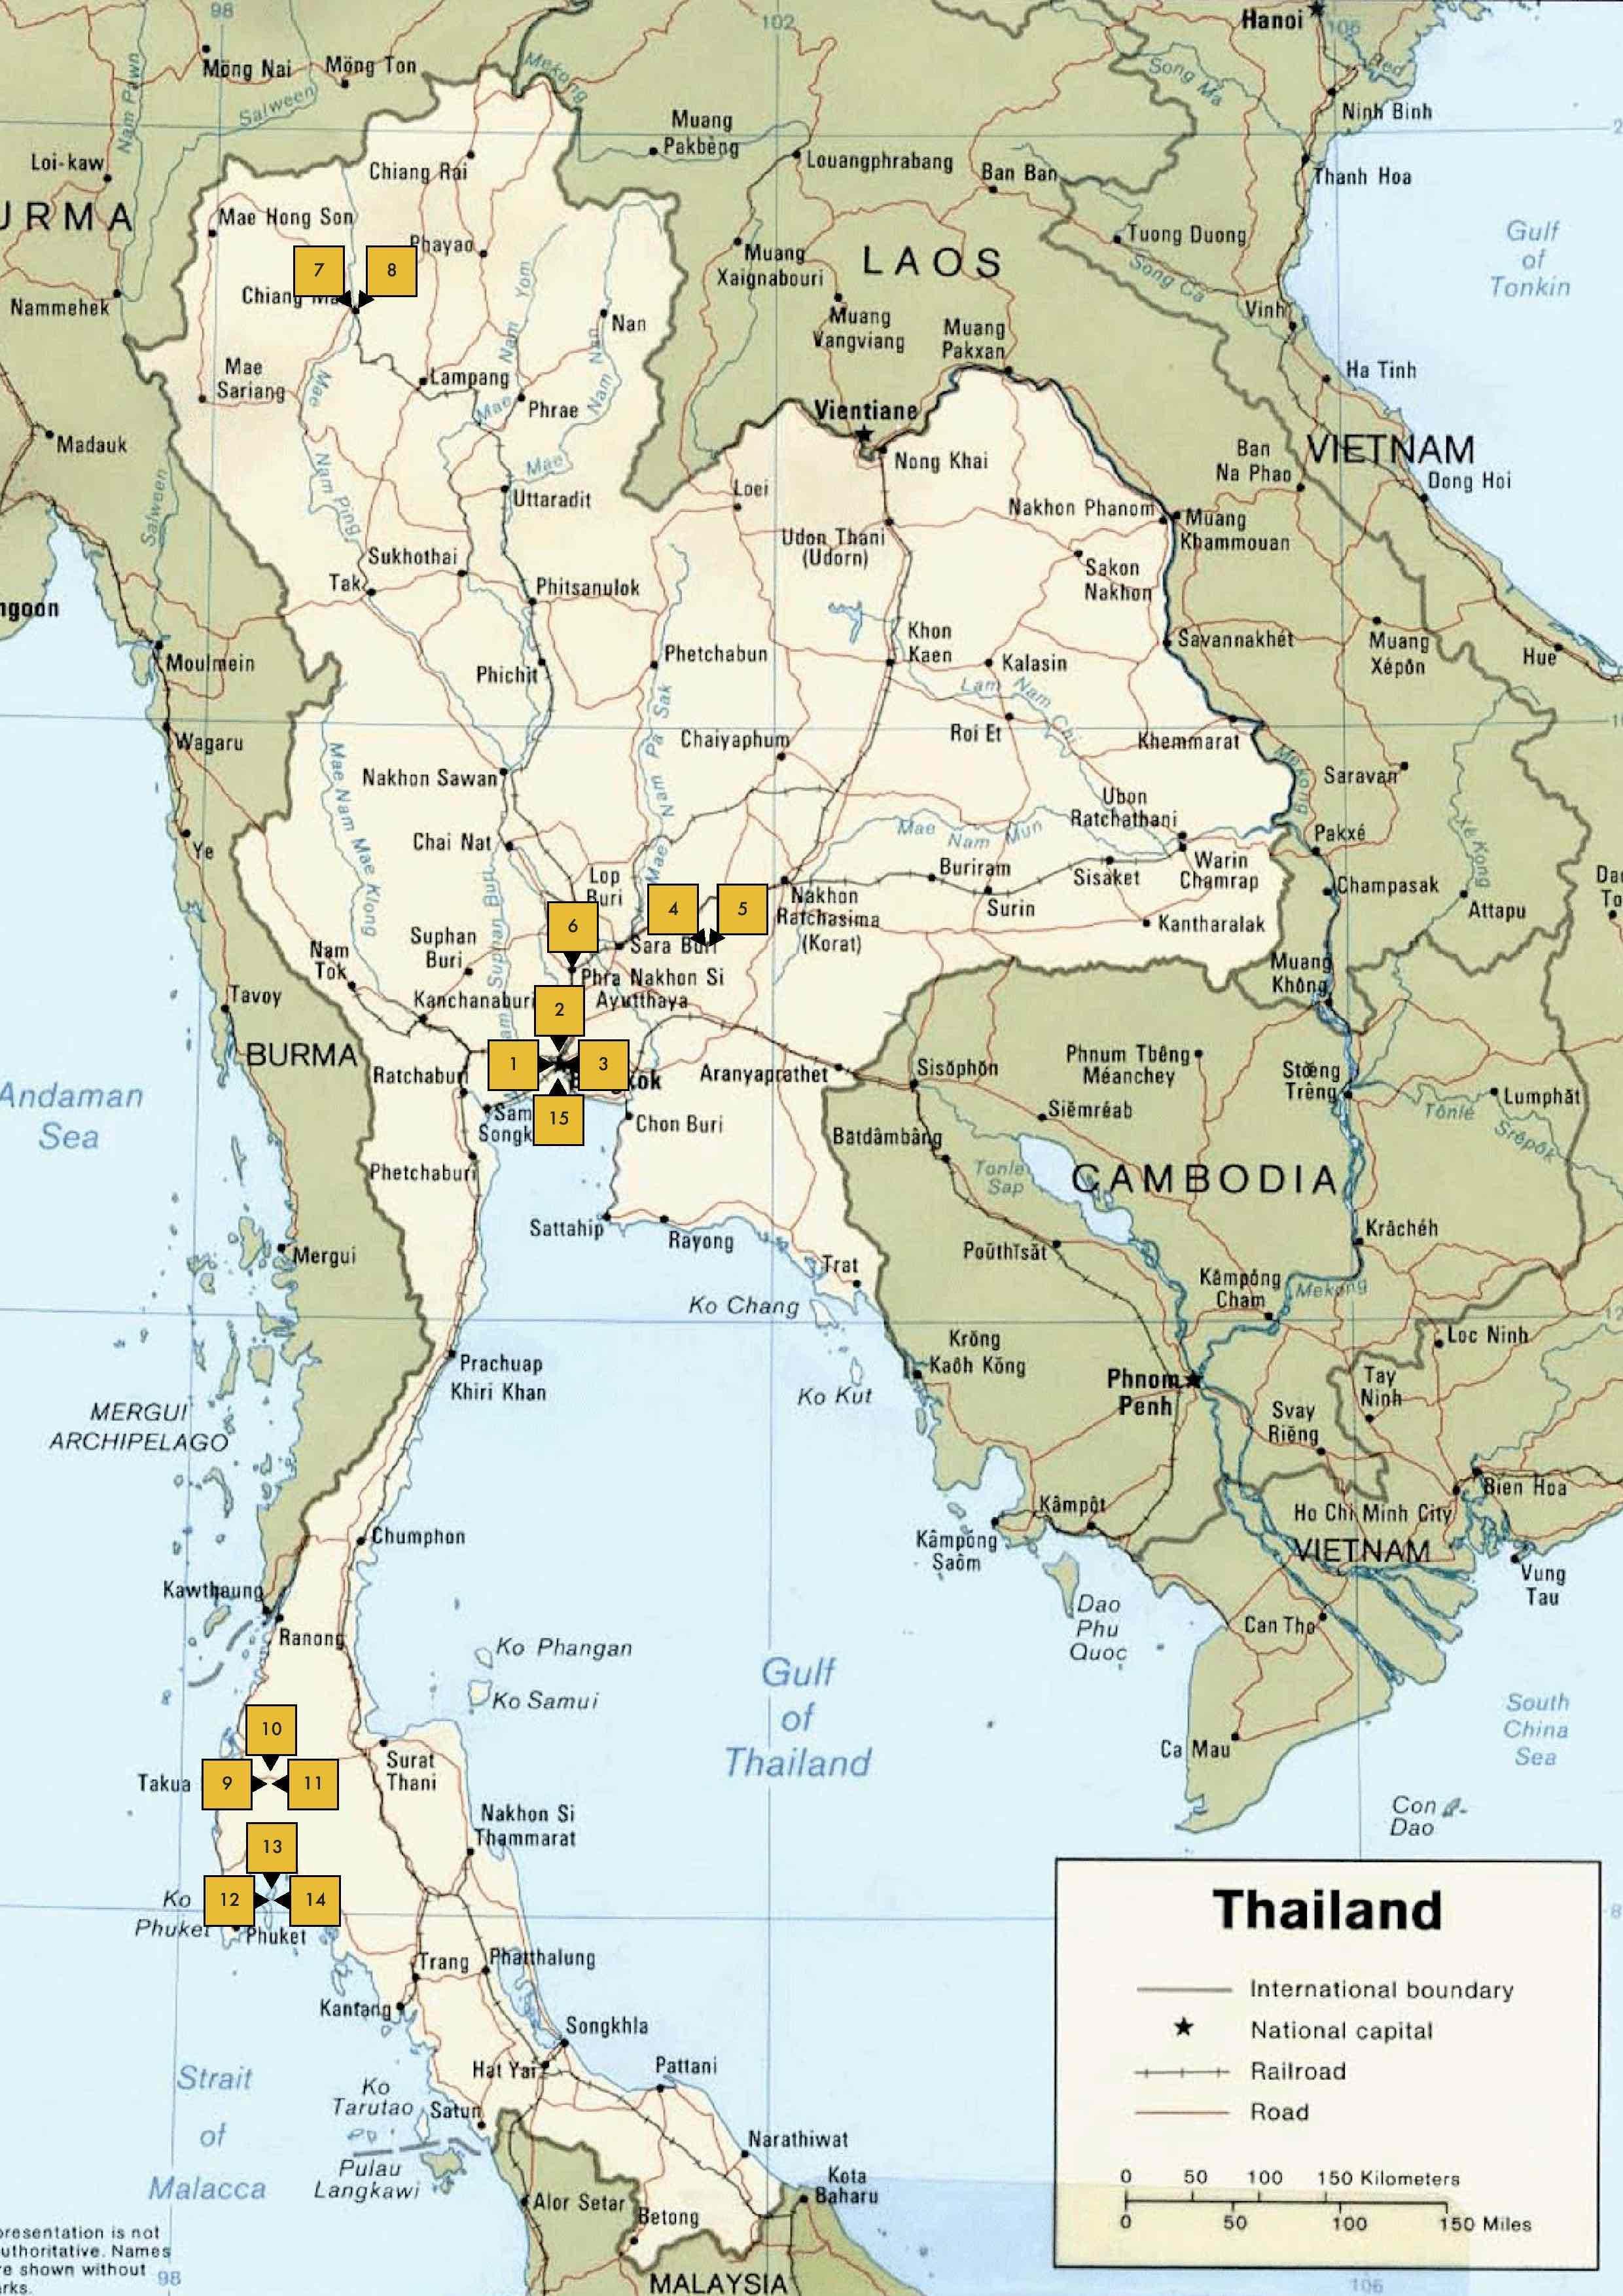 THE BIG TRIP: THAILAND MAP